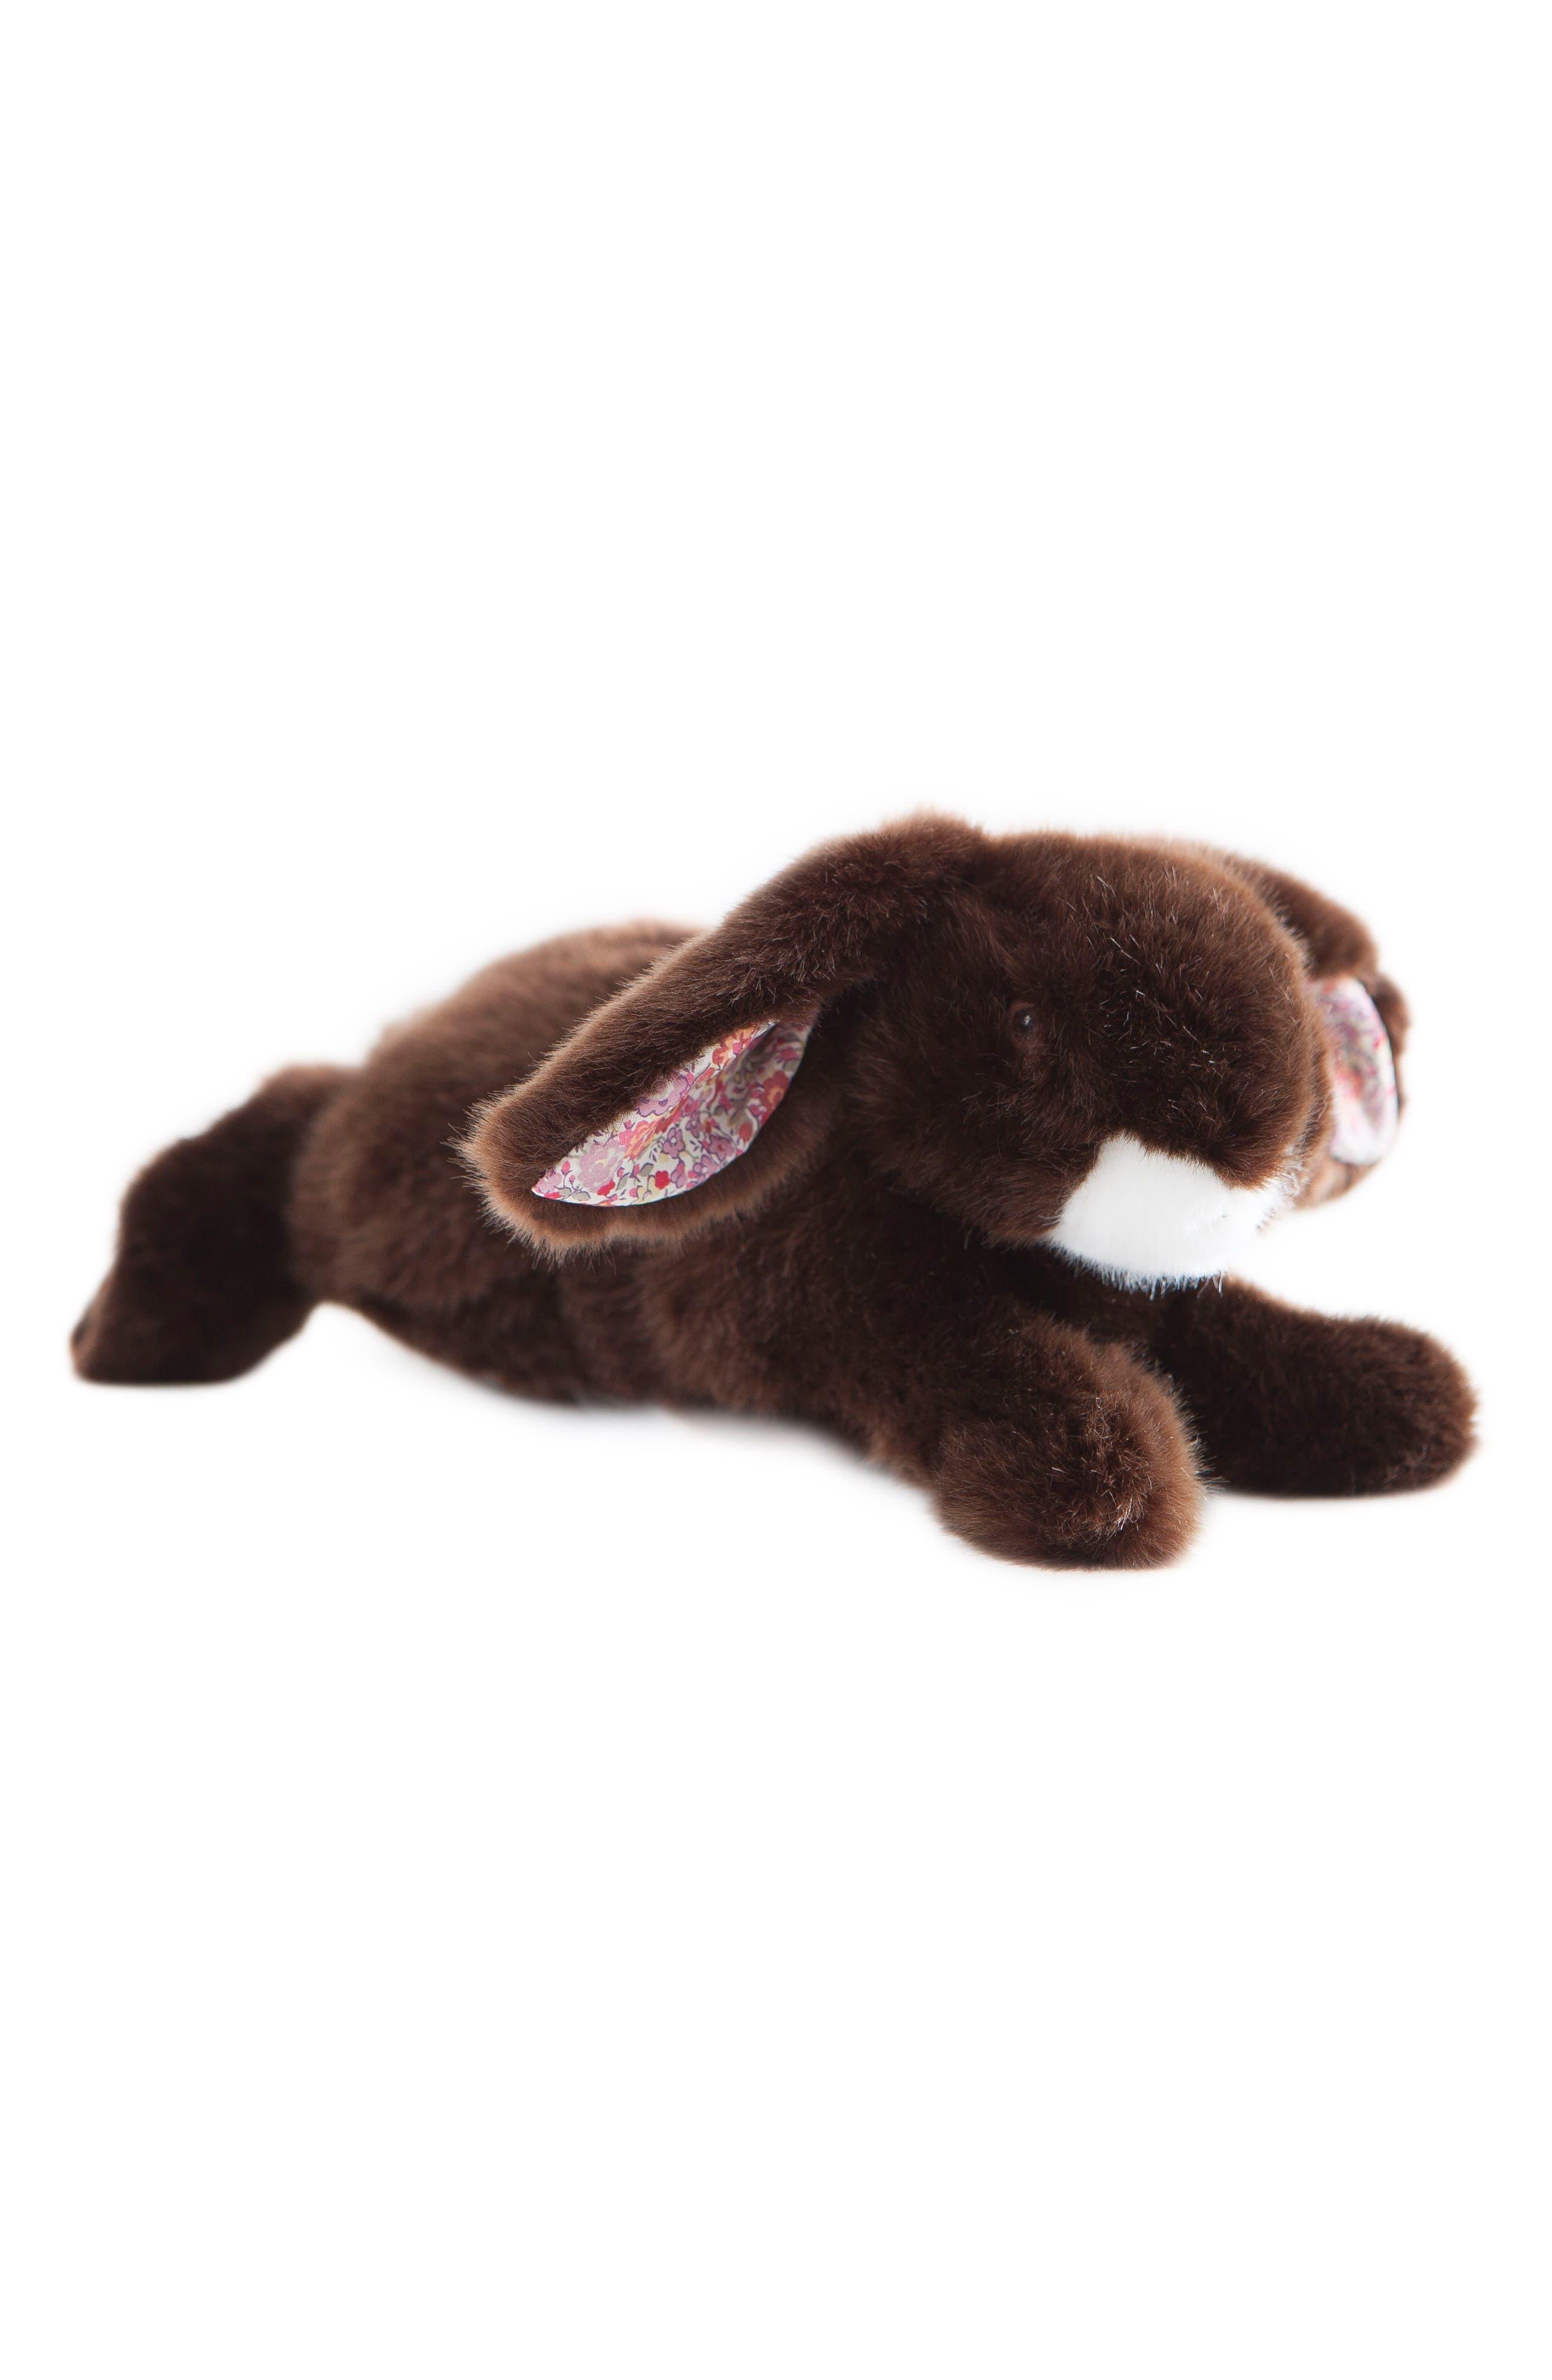 Pamplemousse Peluches x Liberty of London Martin the Rabbit Stuffed Animal